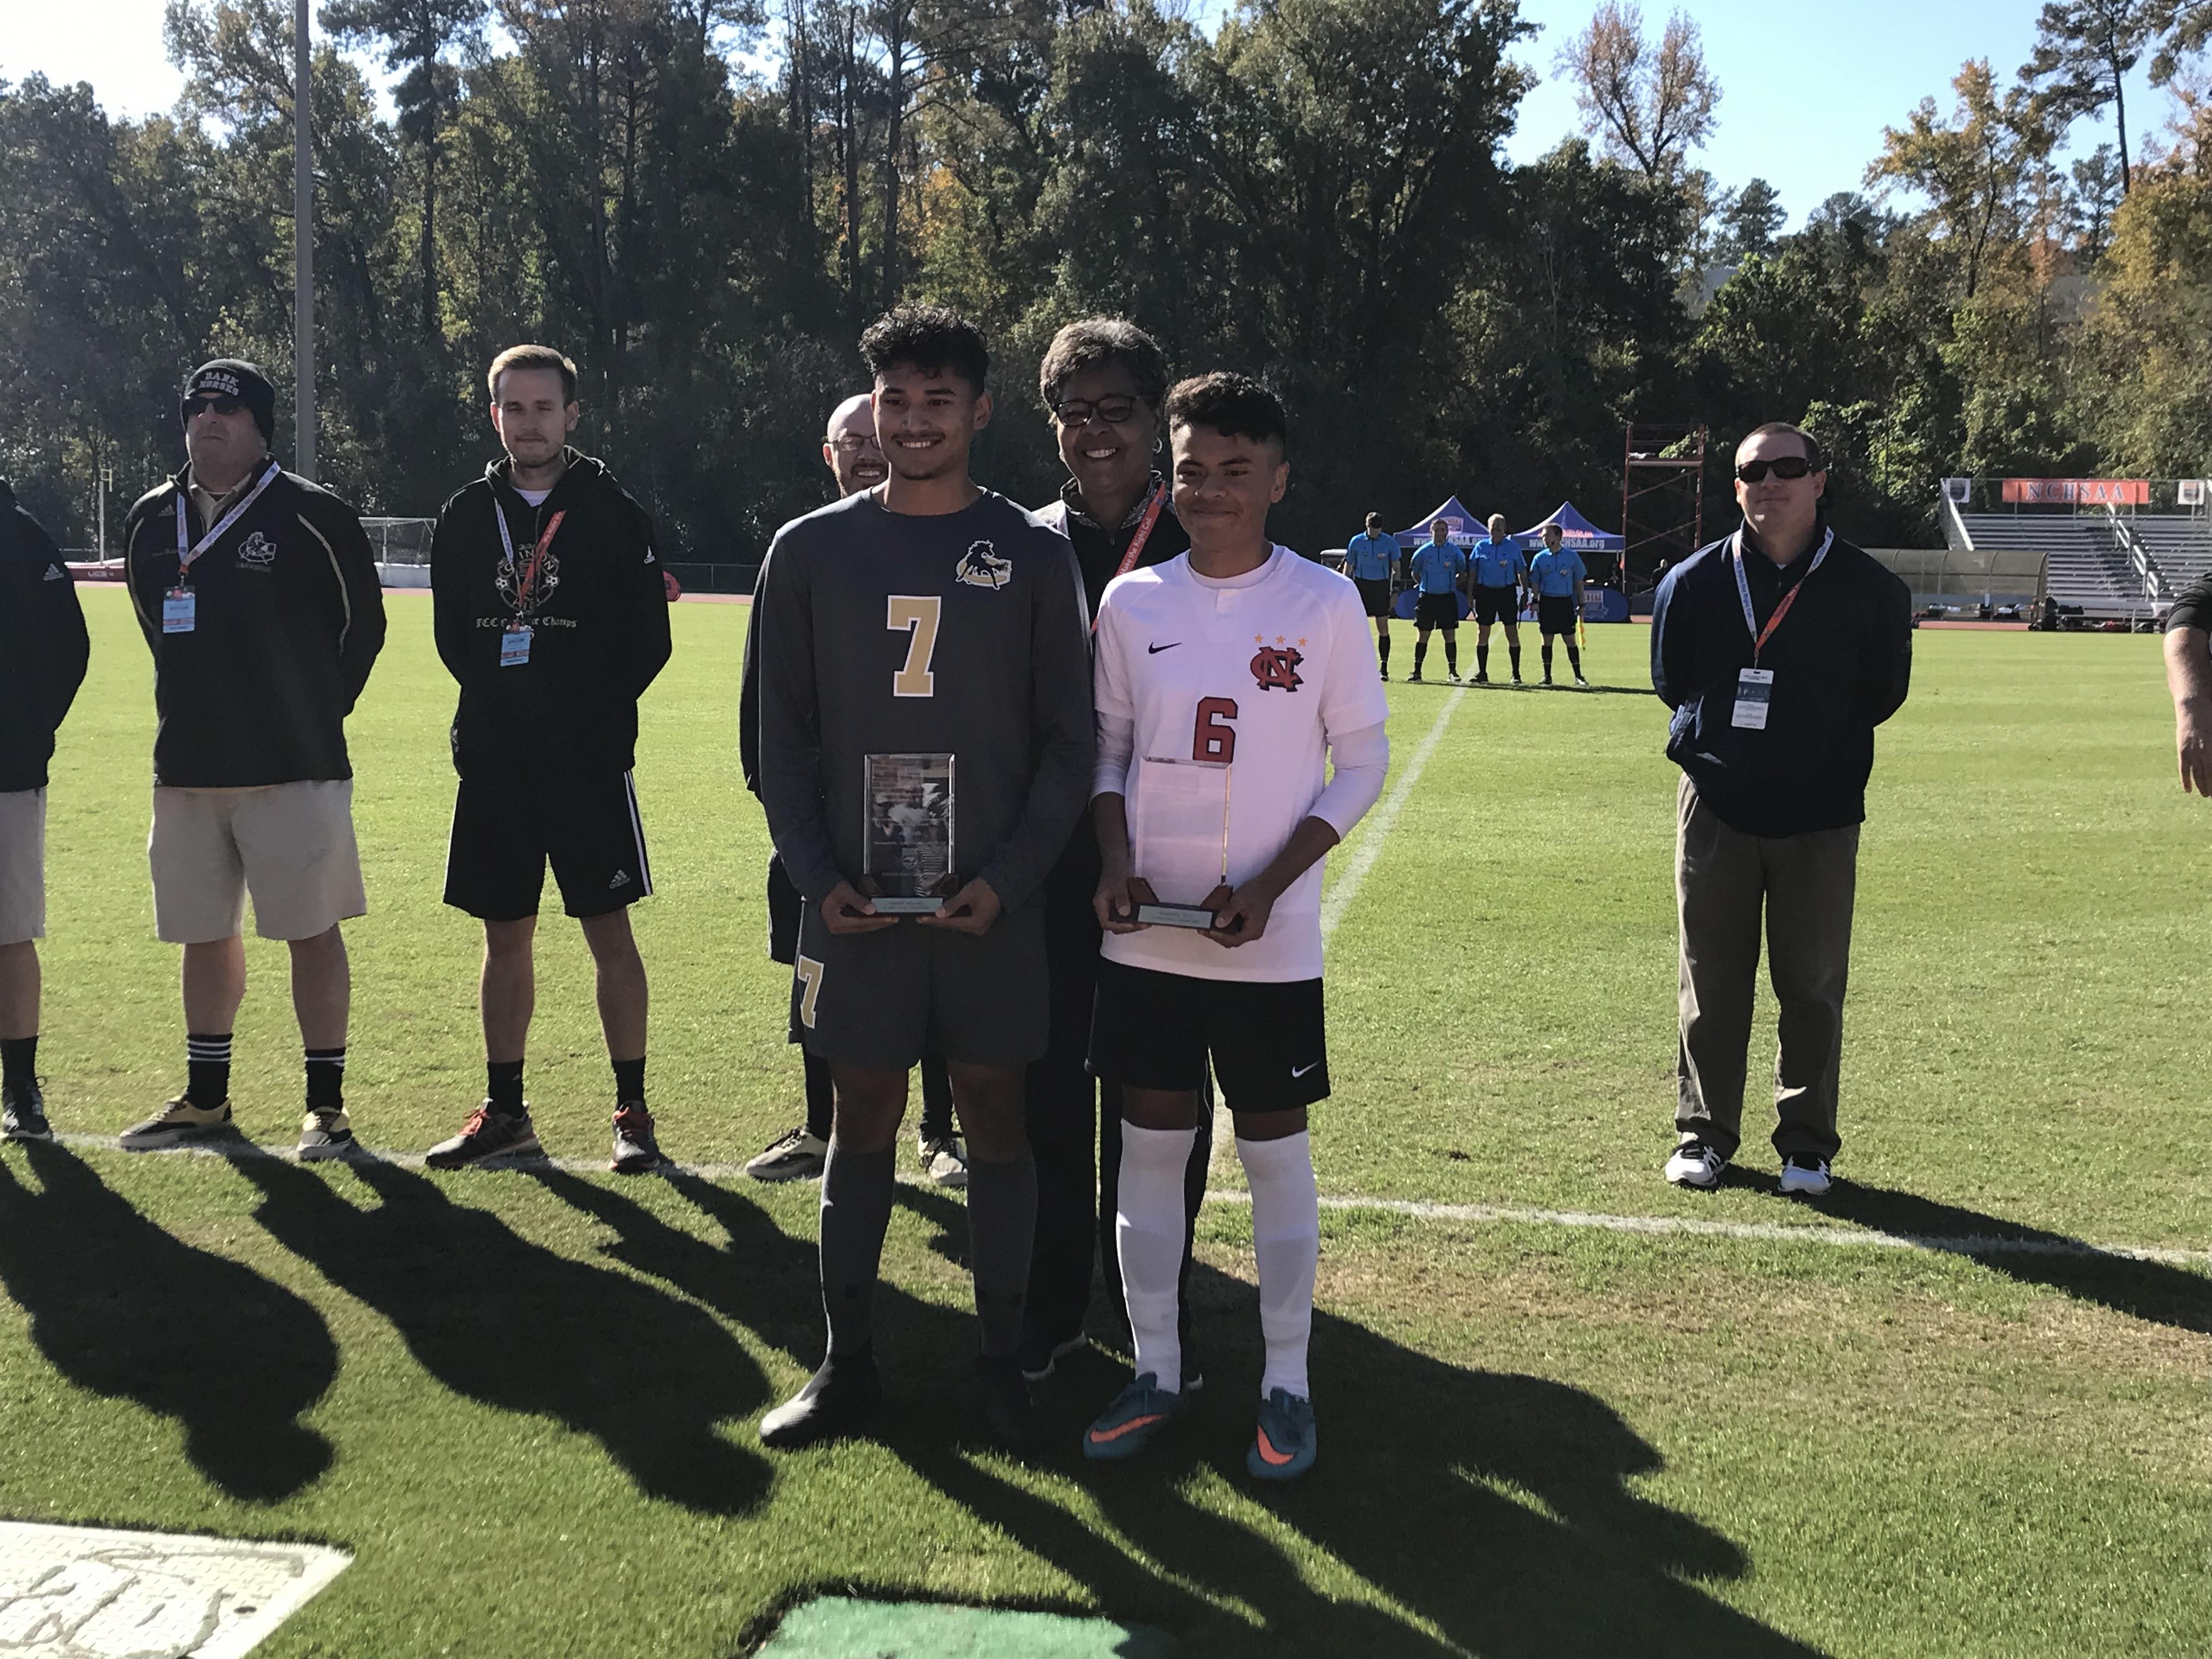 Manuel Murrillo (Clinton) & Benjamin Soto (N-C) 2018 2A Sportsmanship MSOC